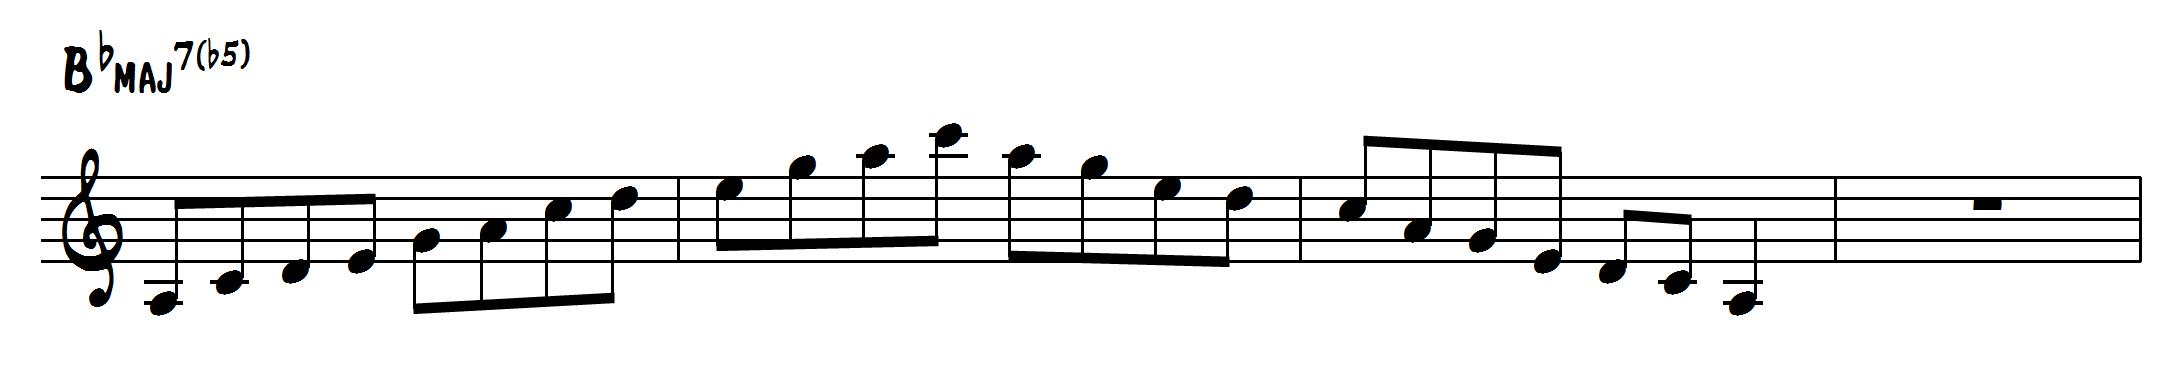 Bbmaj7(b5)